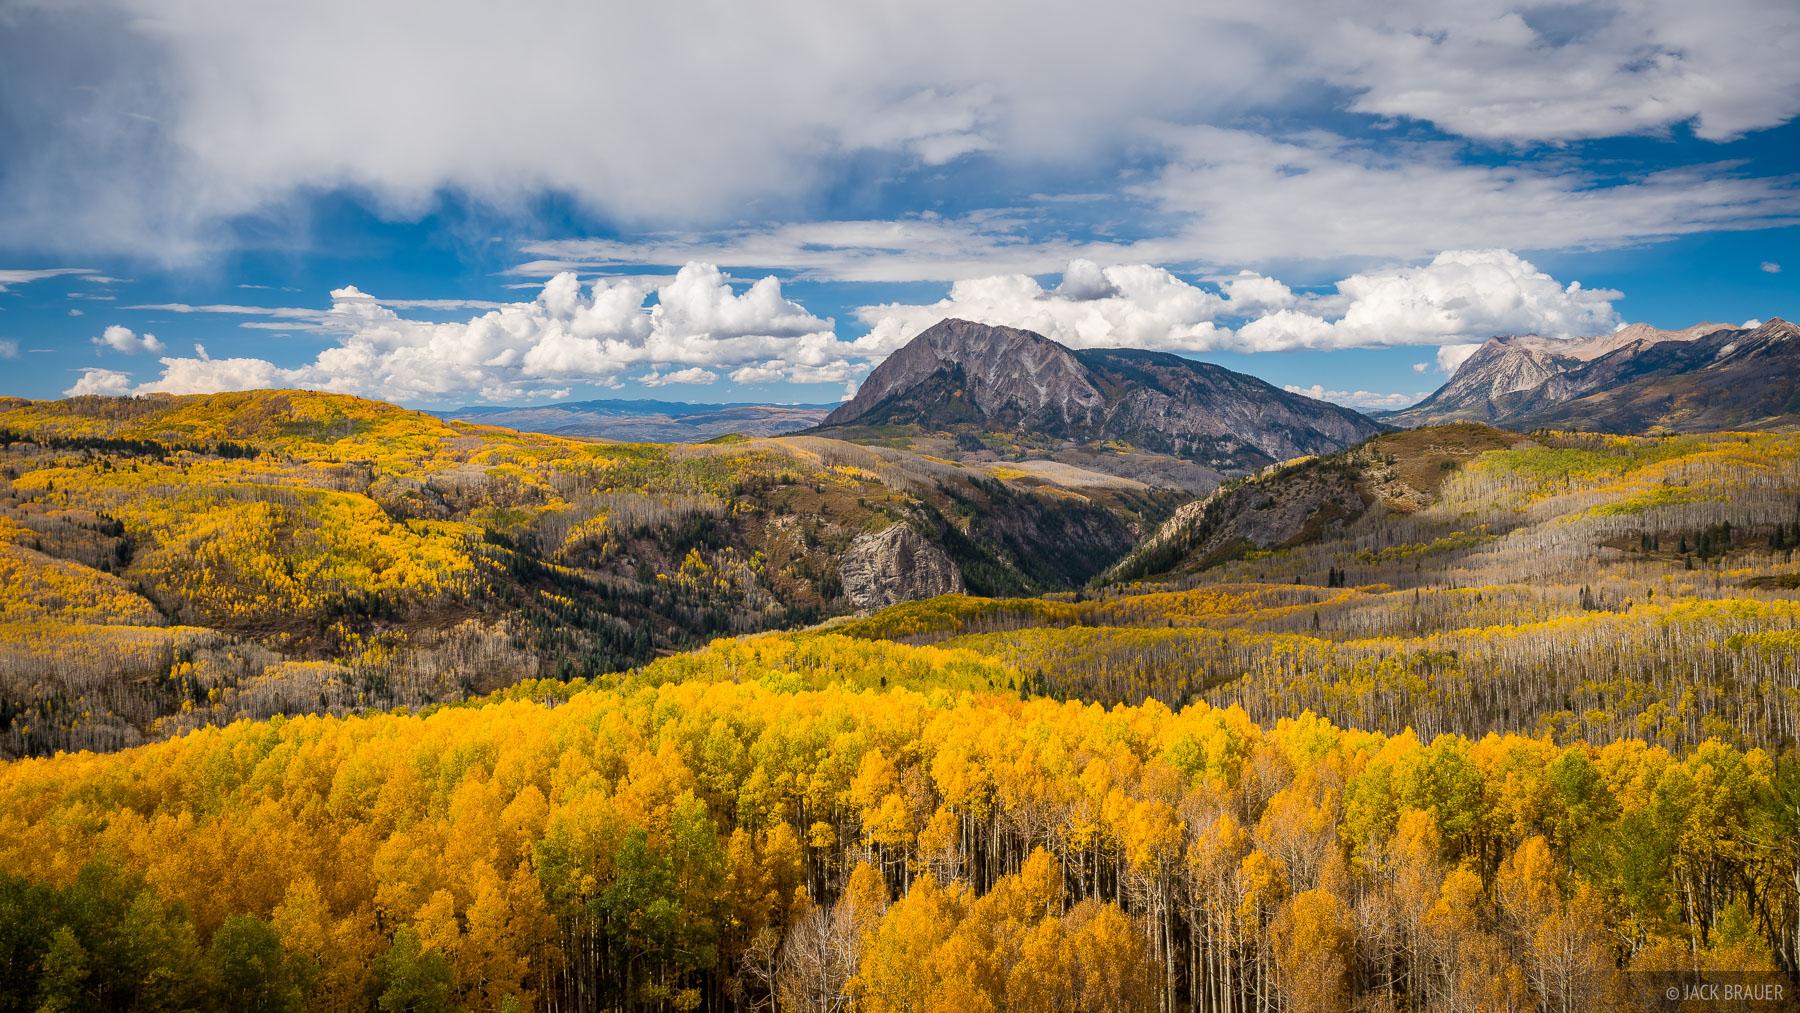 Colorado,Elk Mountains,Kebler Pass, Marcellina, aspens, October